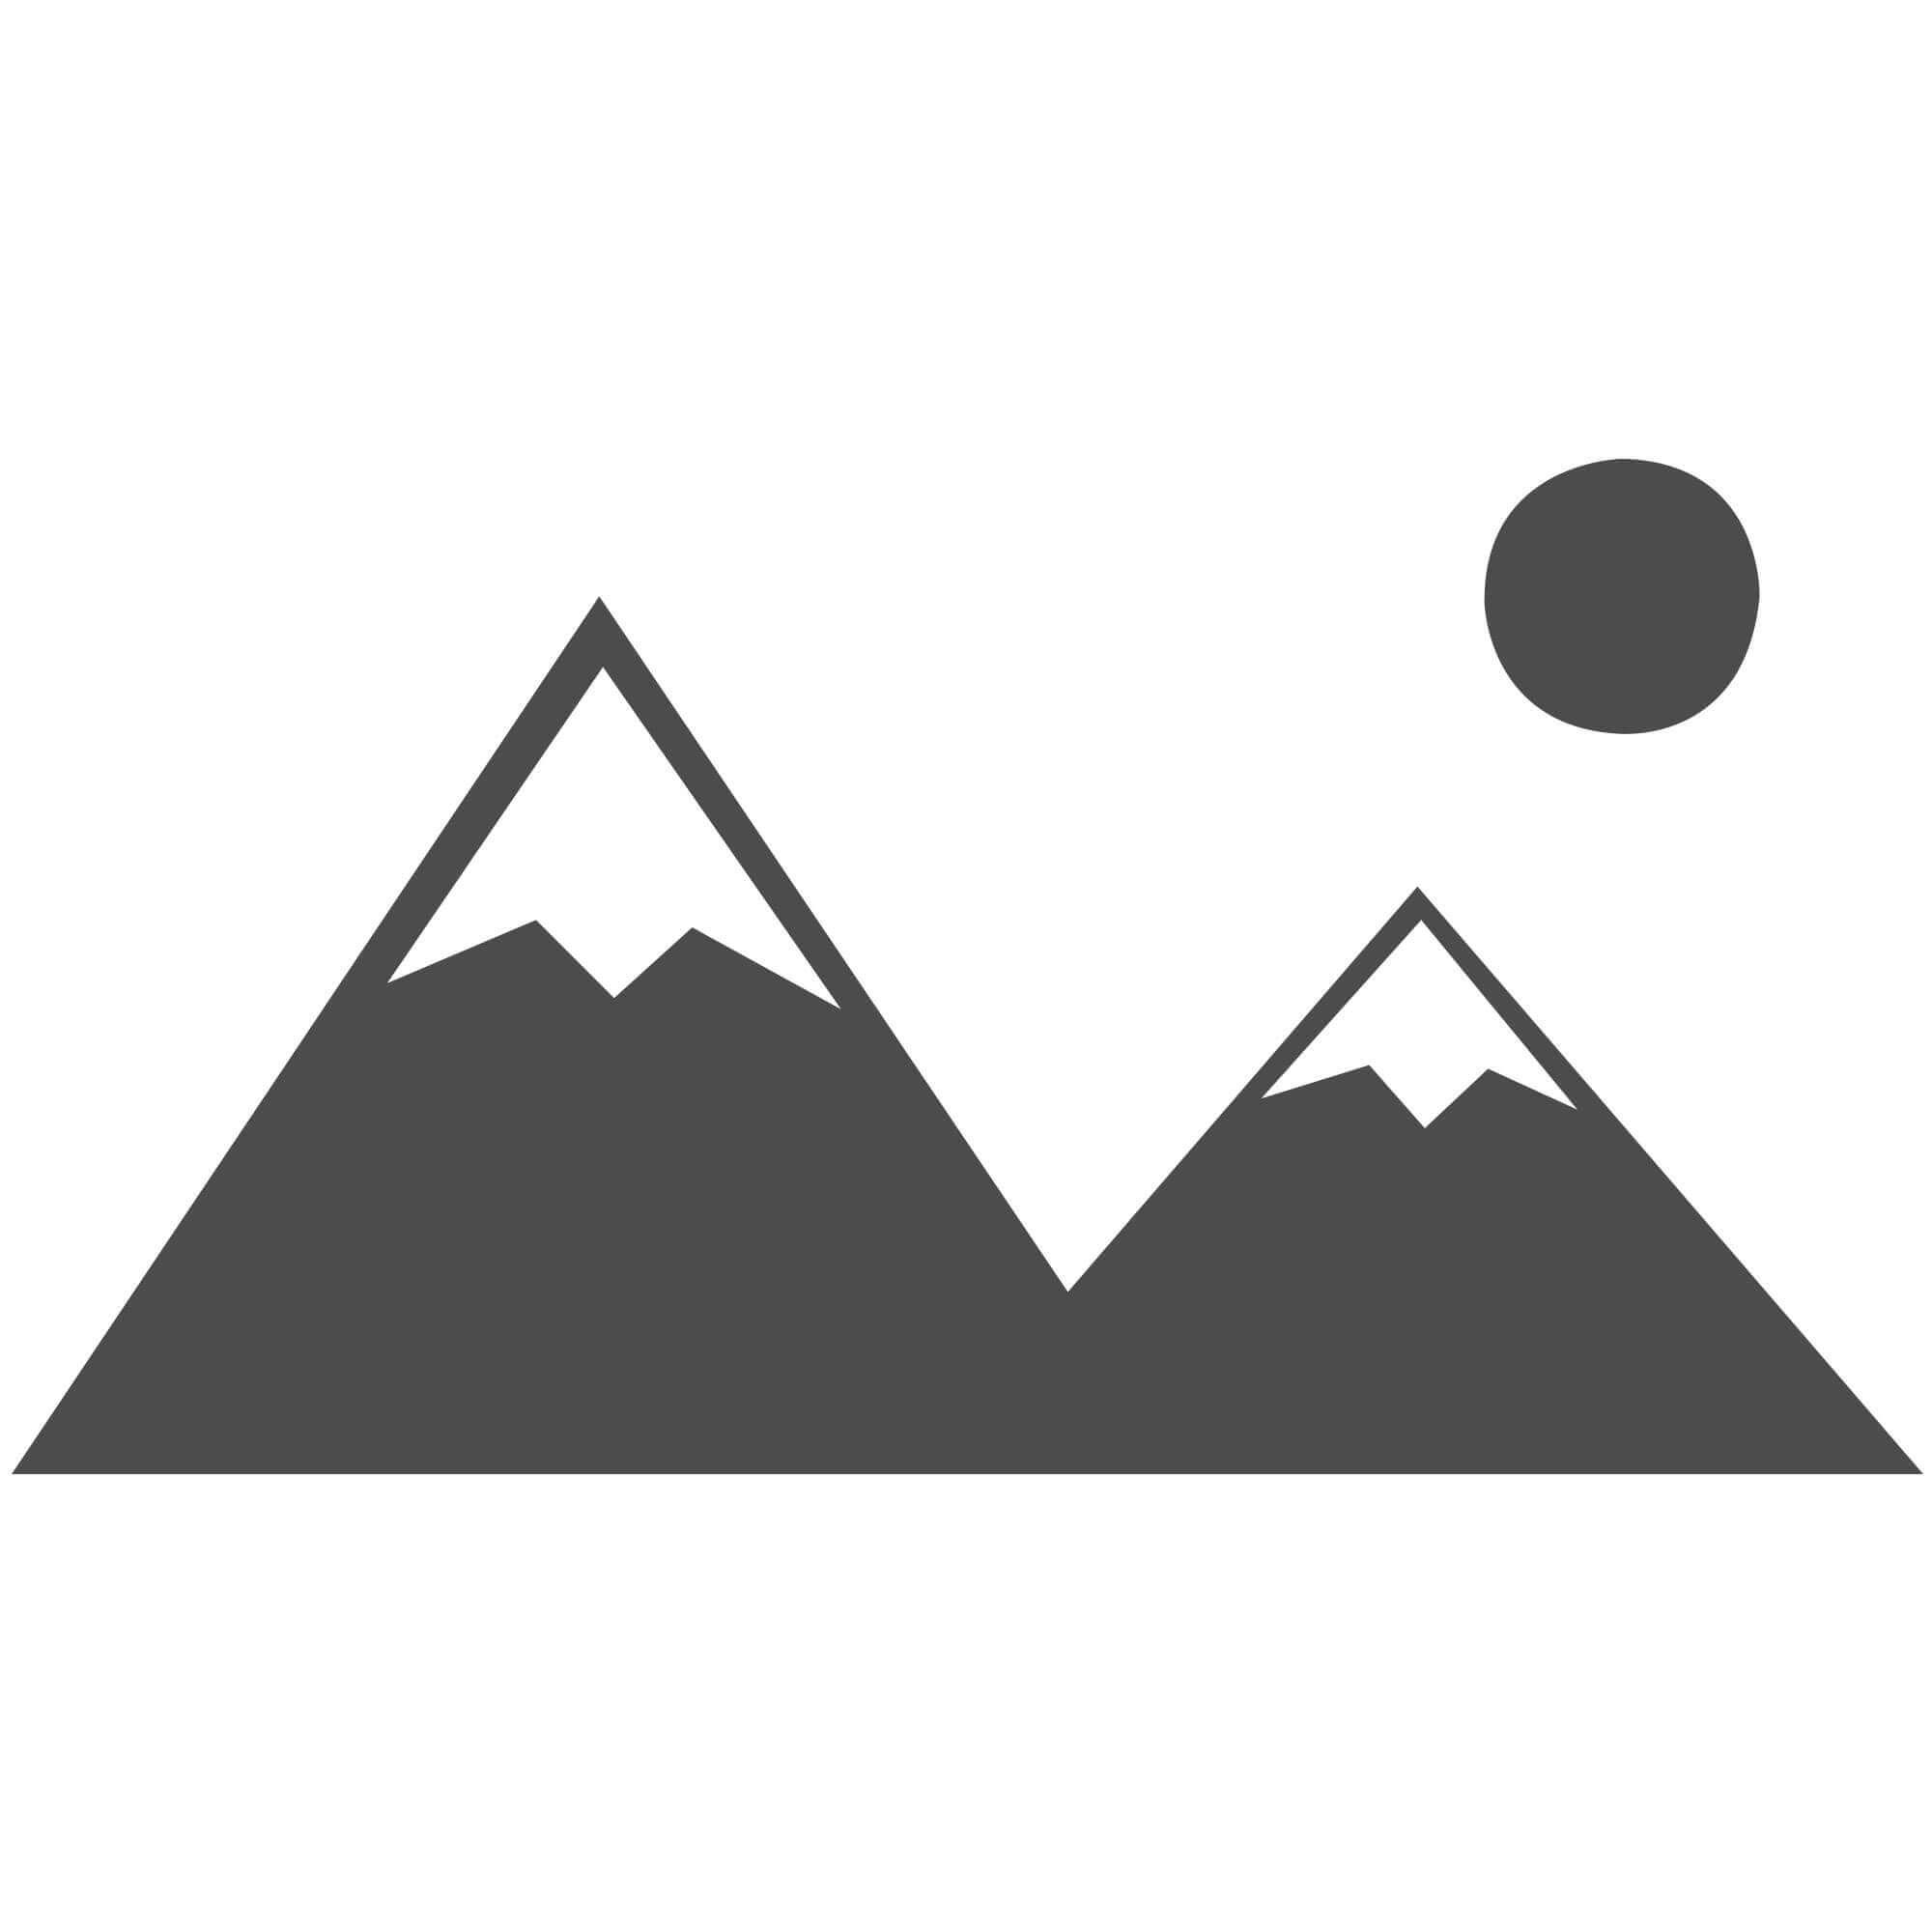 "Nordic Cariboo Shaggy Rug - Brown - Size 60 x 110 cm (2' x 3'7"")"